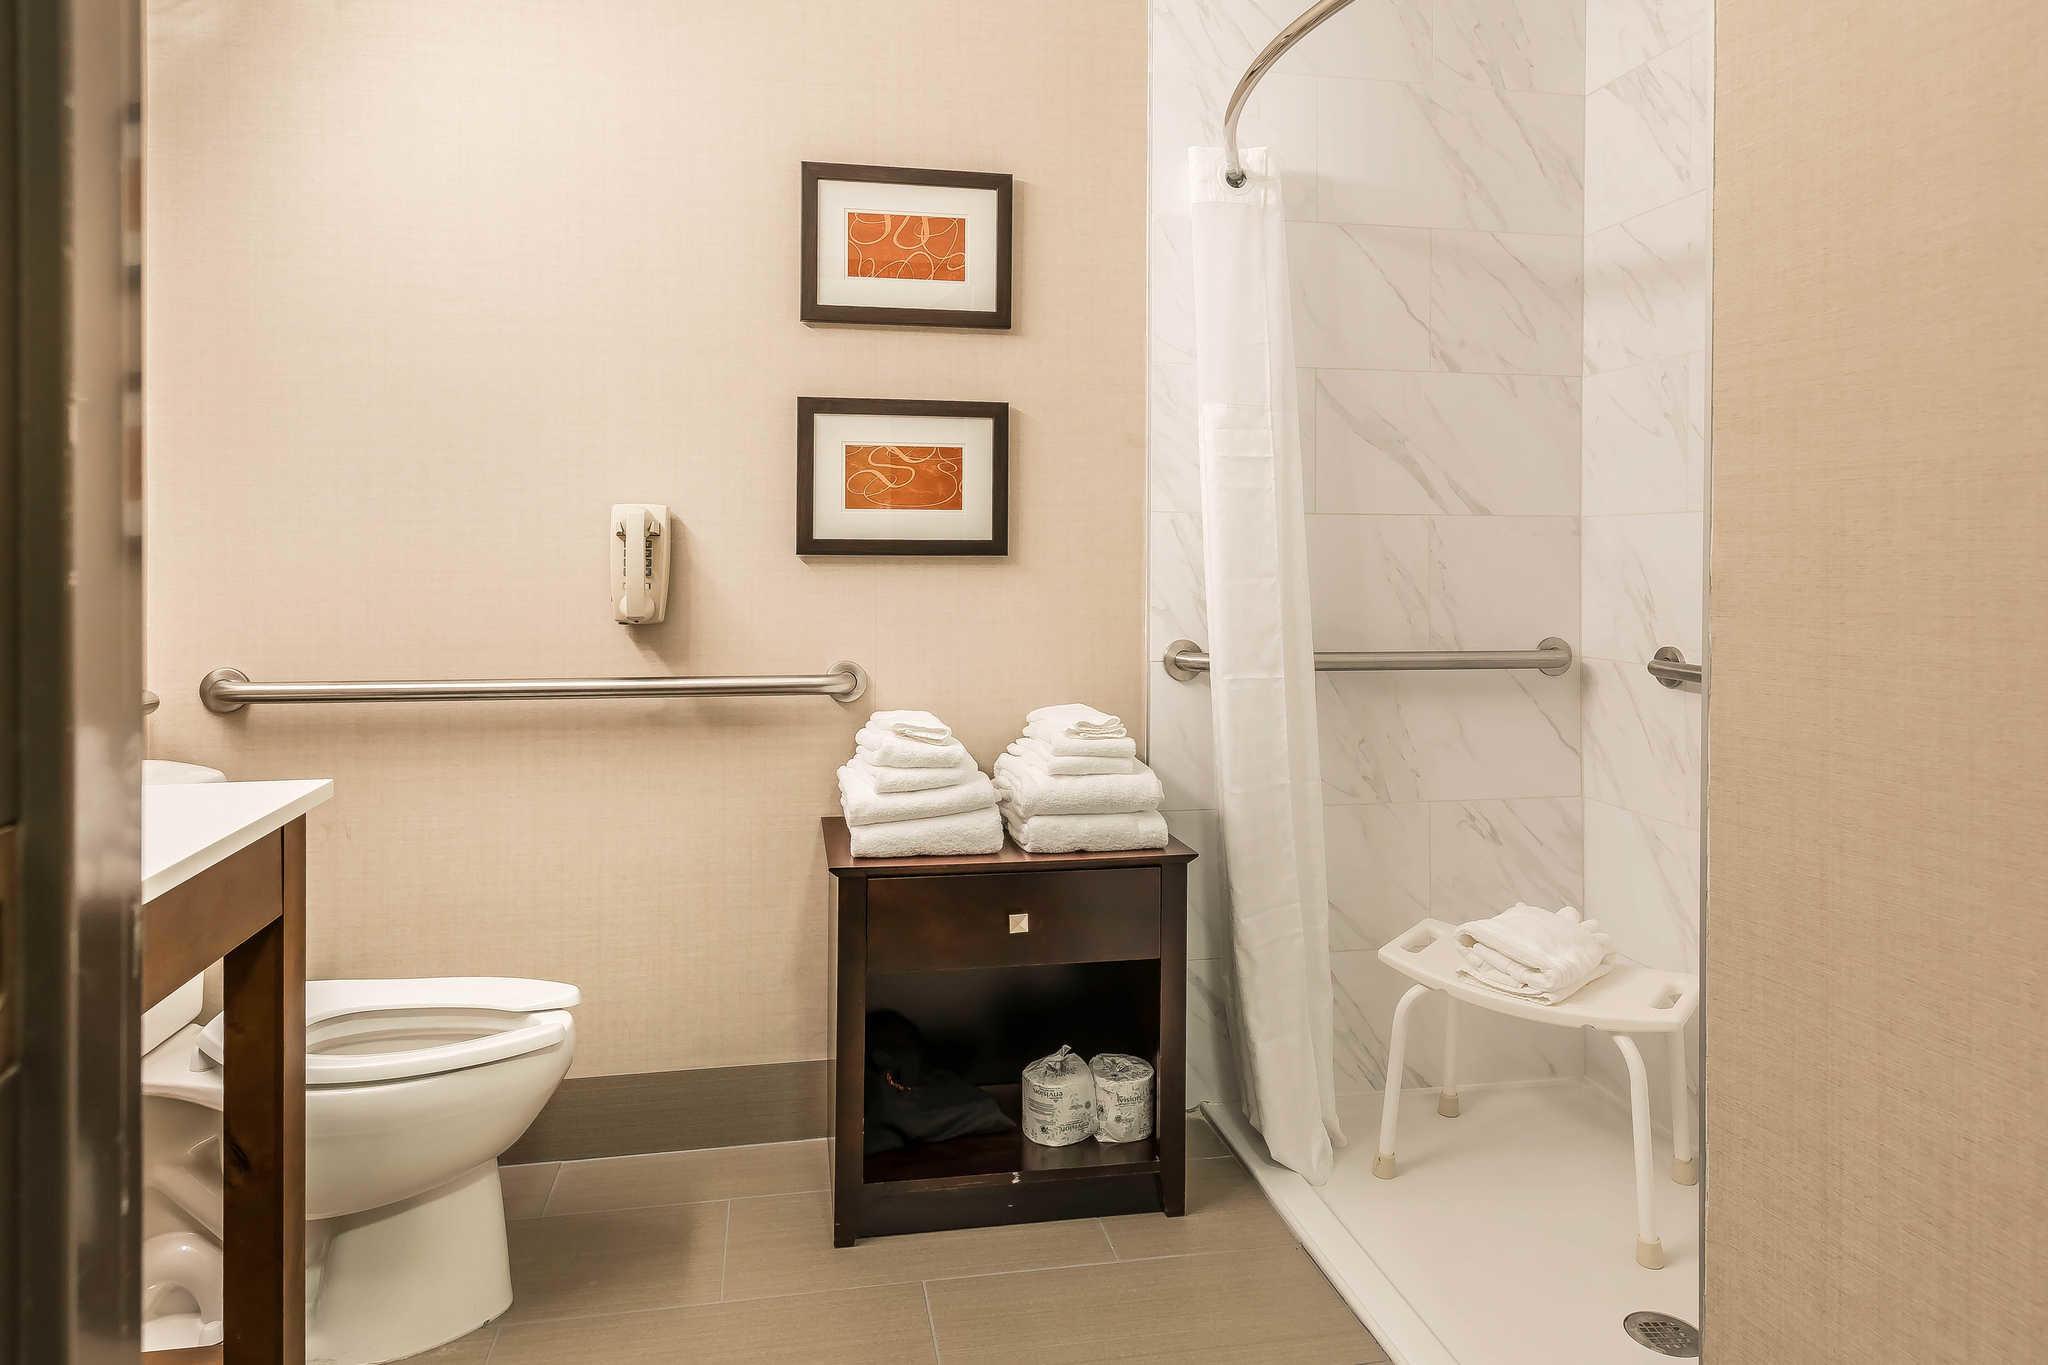 Comfort Suites North image 11